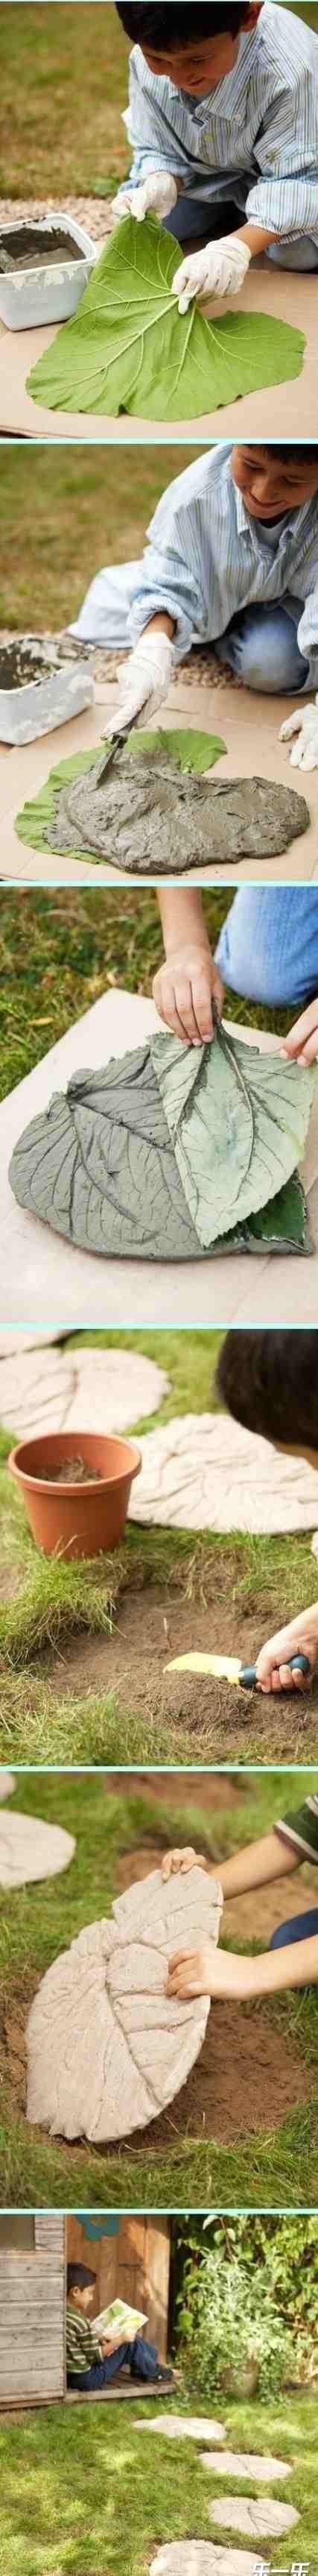 Tremplins en béton rhubarbe ou hosta feuille diy